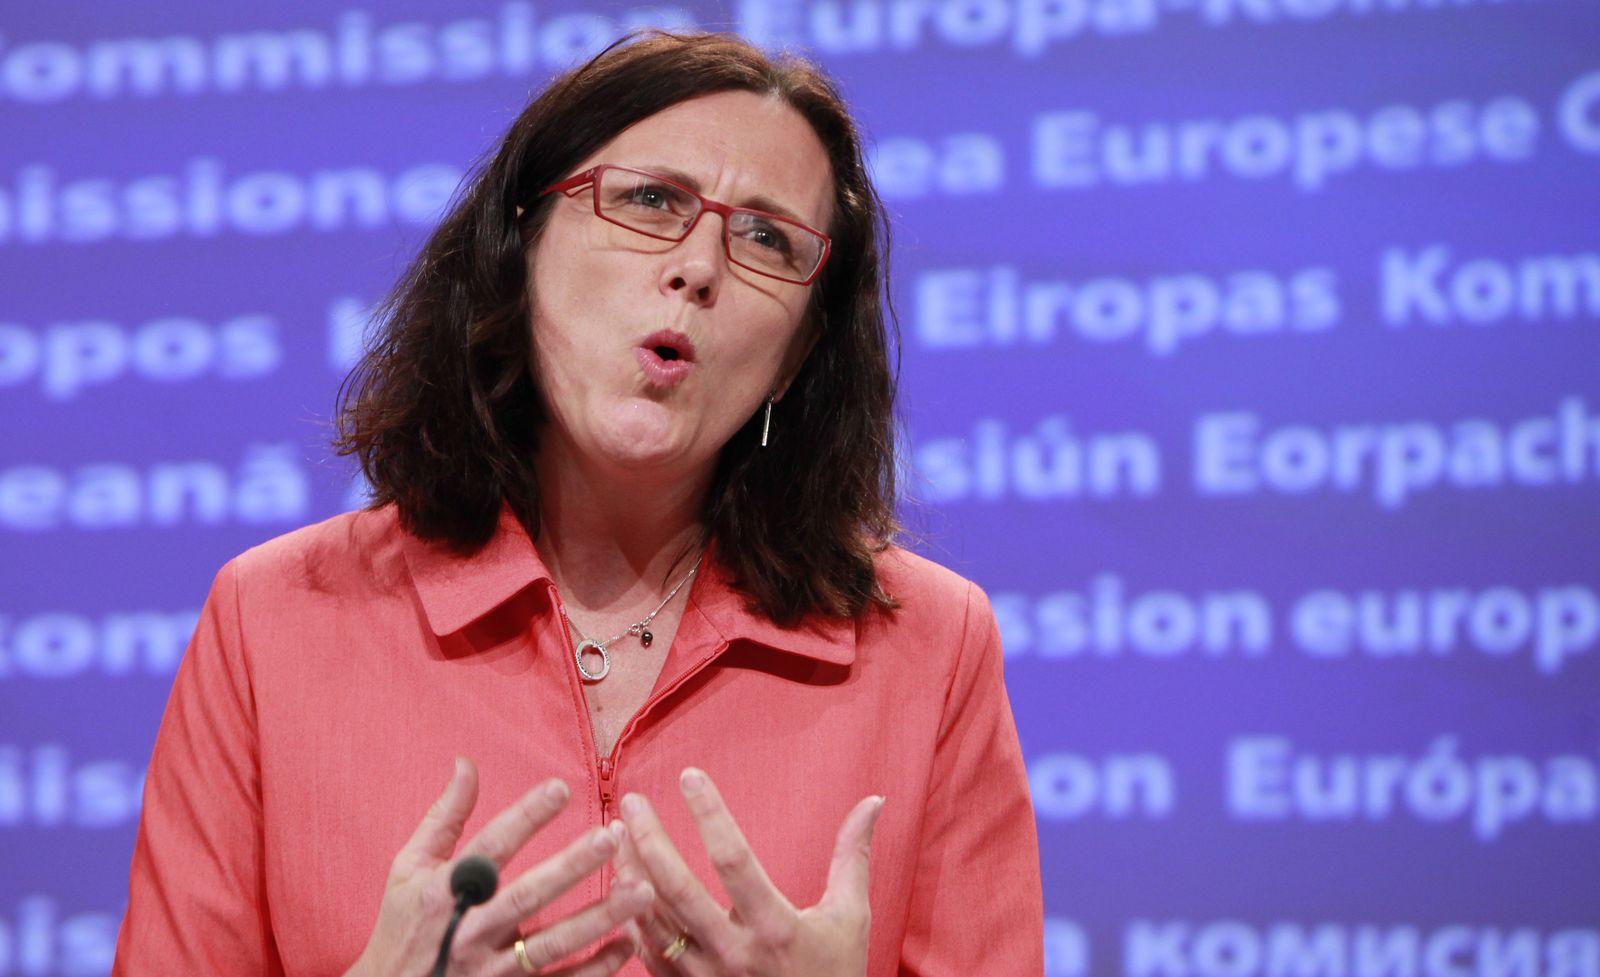 European home affairs Commissioner, Swedish, Cecilia Malmstrom